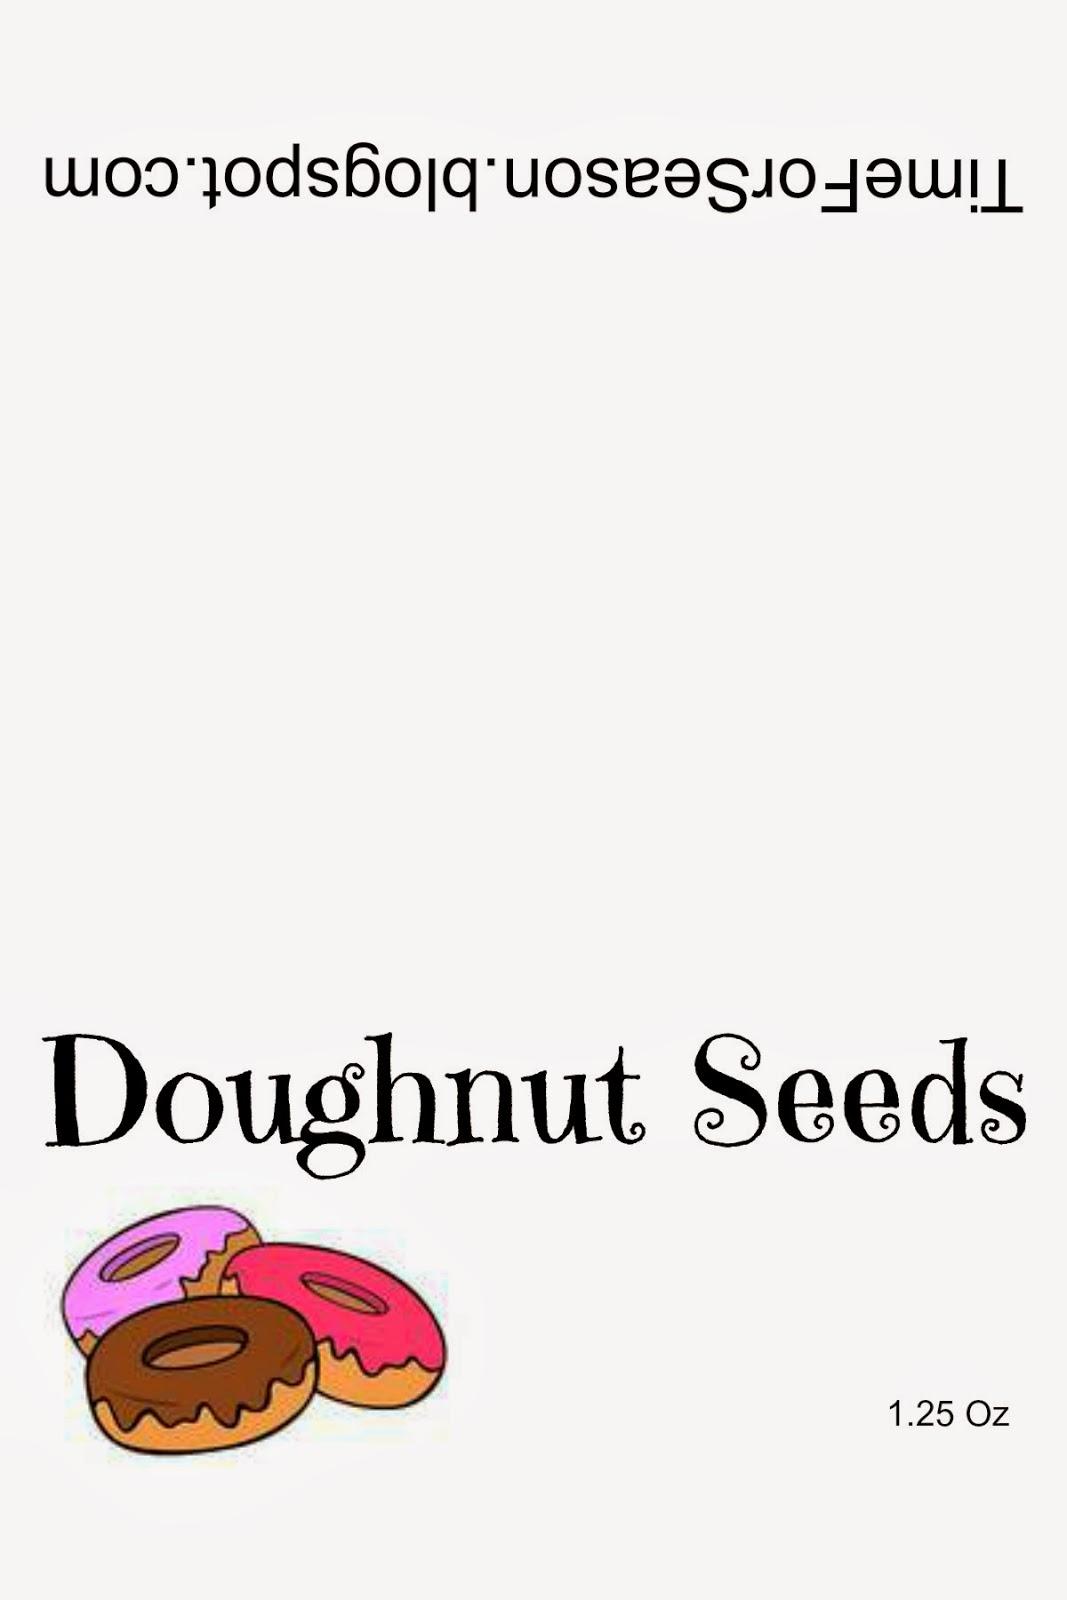 http://i22.photobucket.com/albums/b338/rosems21/DoughnutSeedlabel.jpg